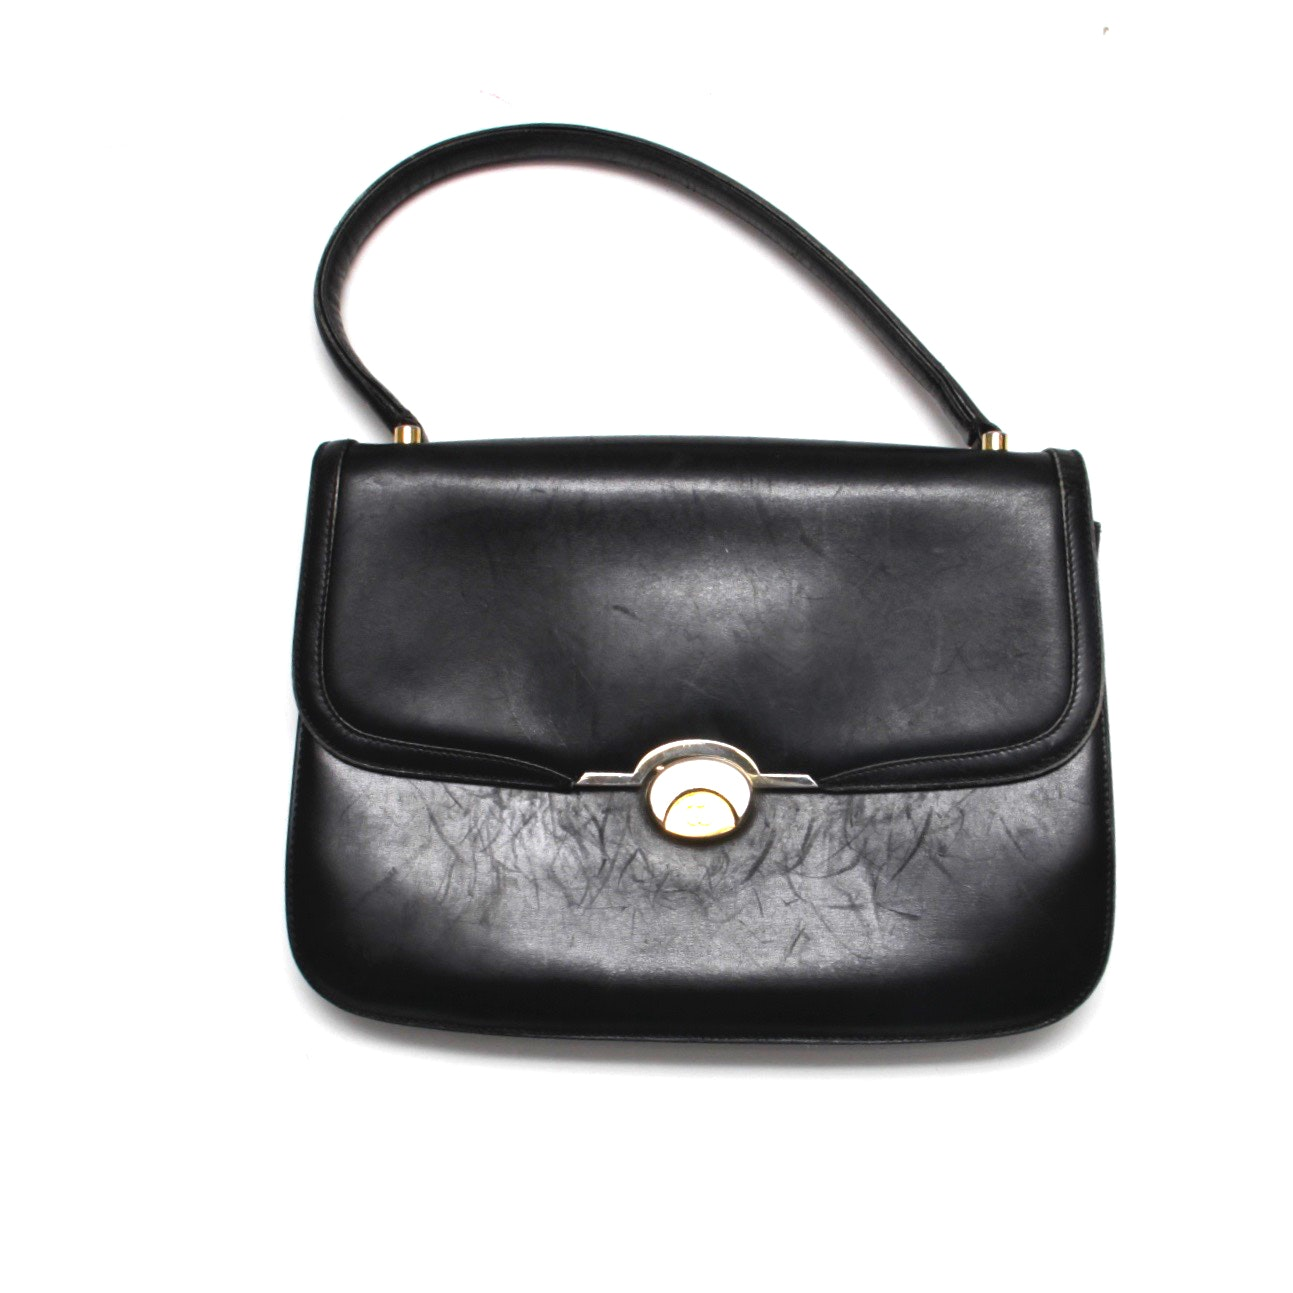 A Vintage Black Leather Gucci Bag